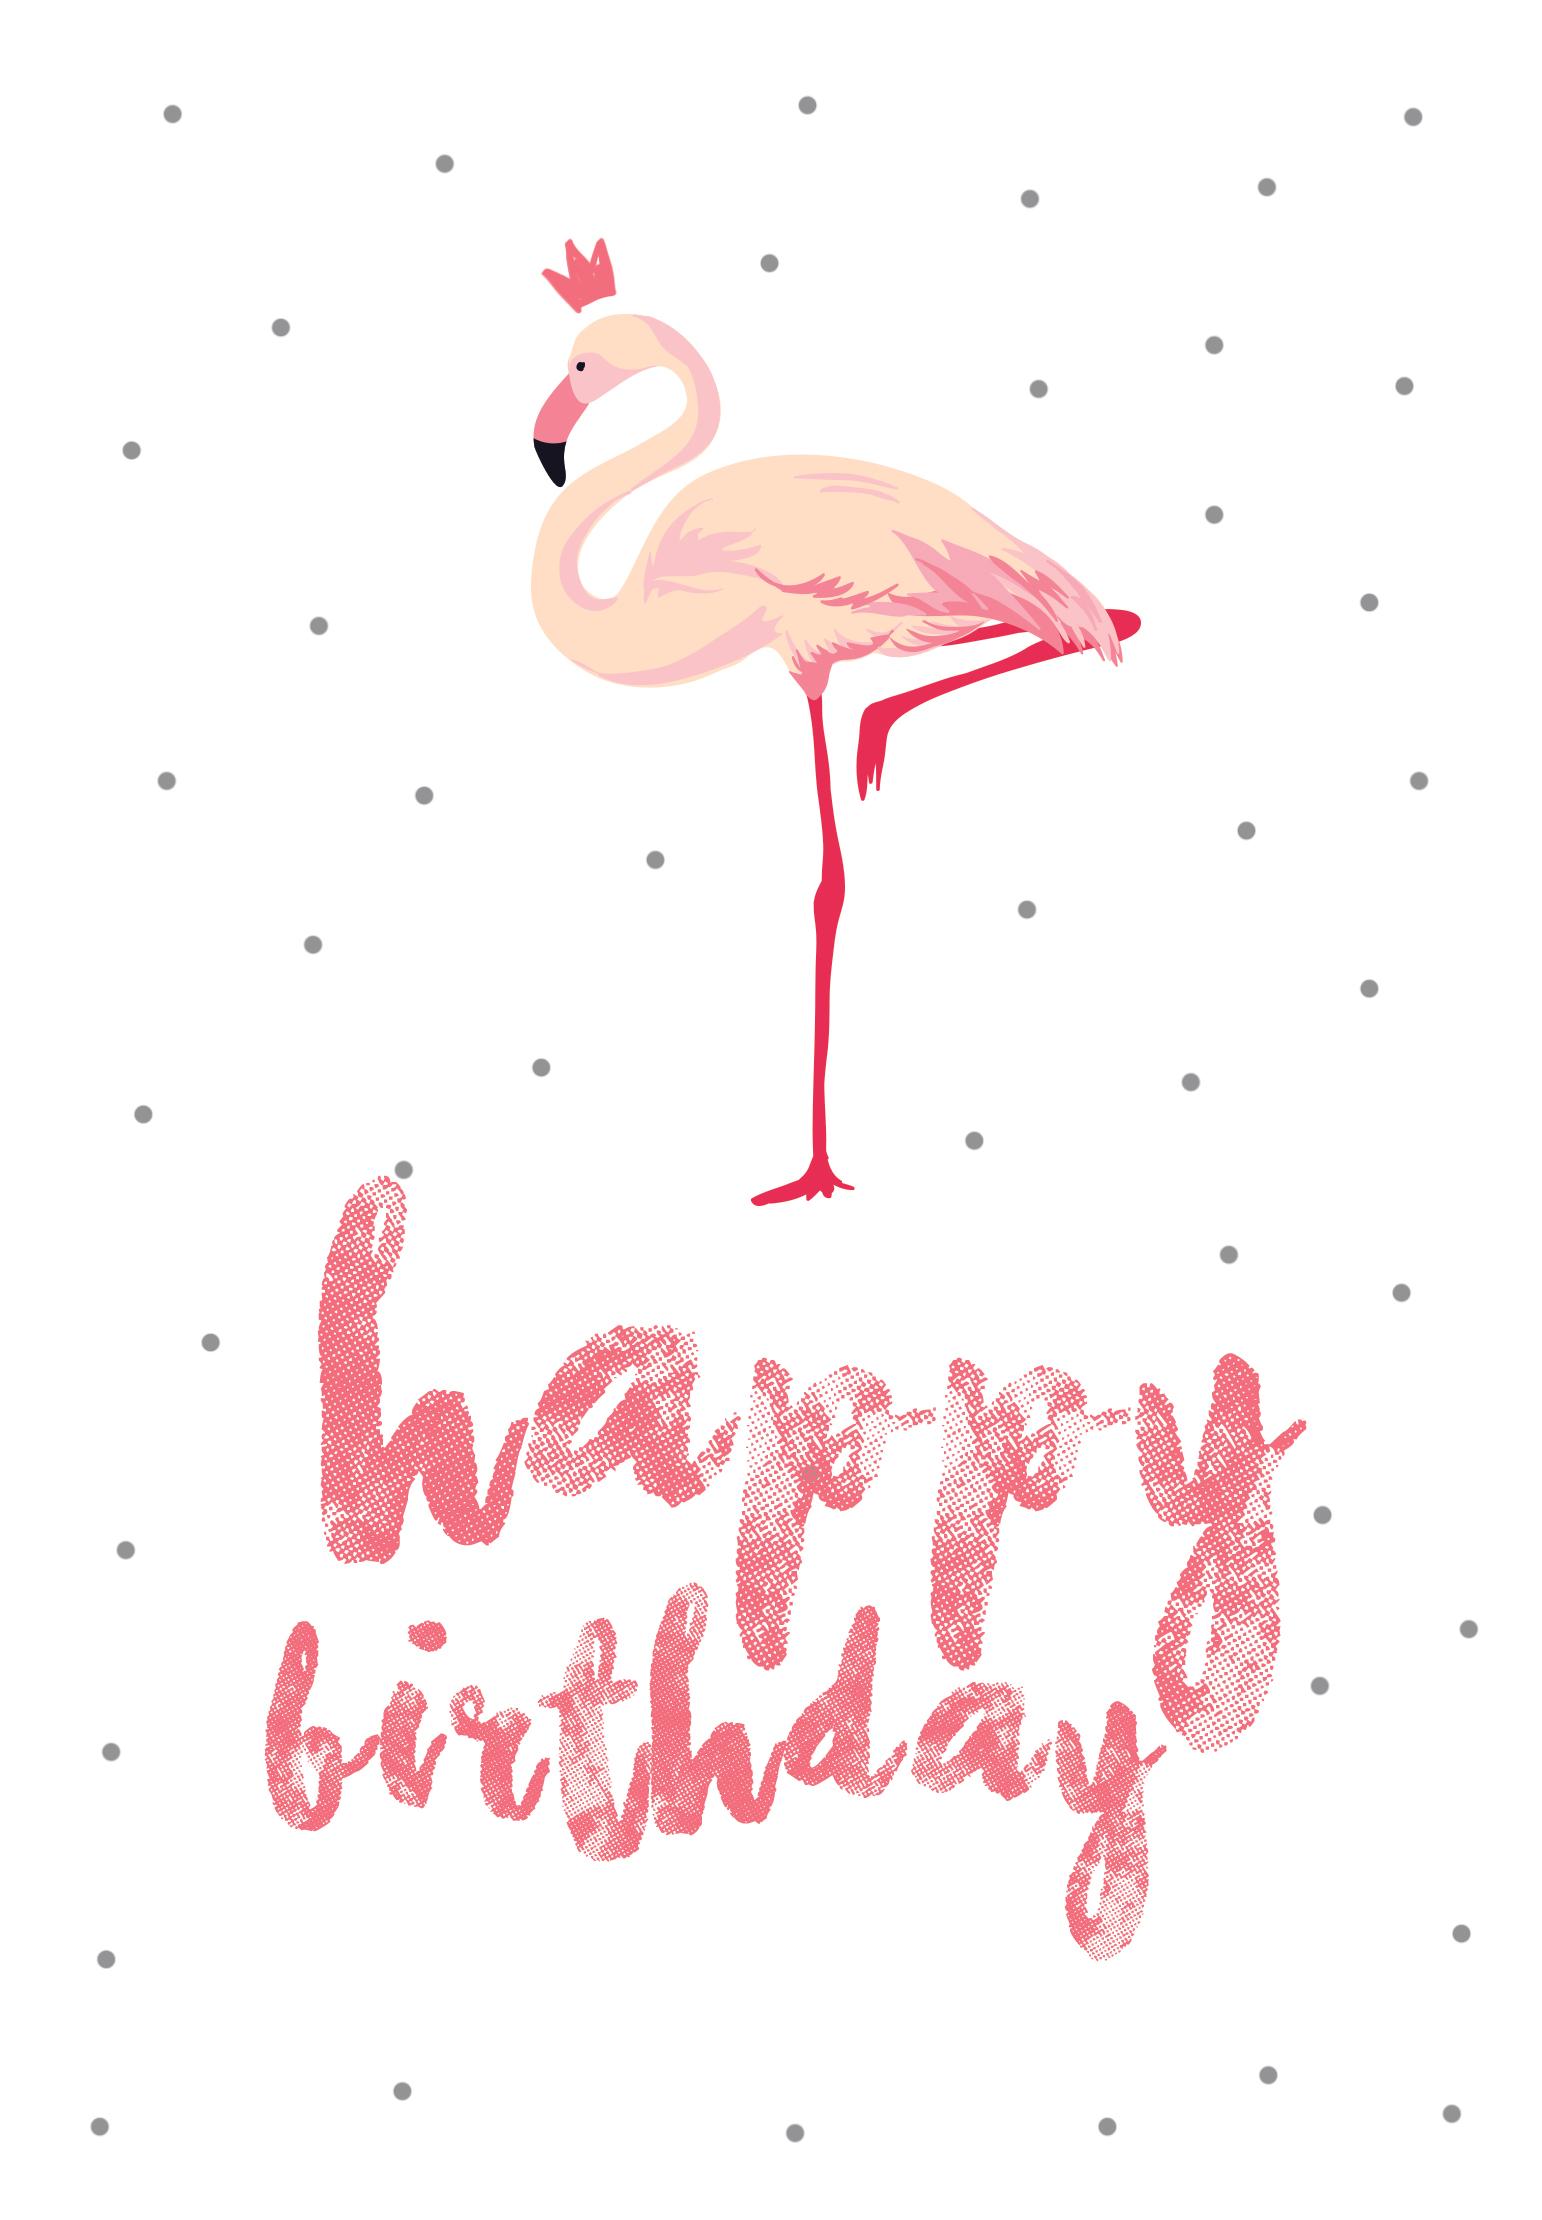 Flamingo Birthday - Free Printable Birthday Card   Greetings Island - Free Printable Birthday Cards For Him